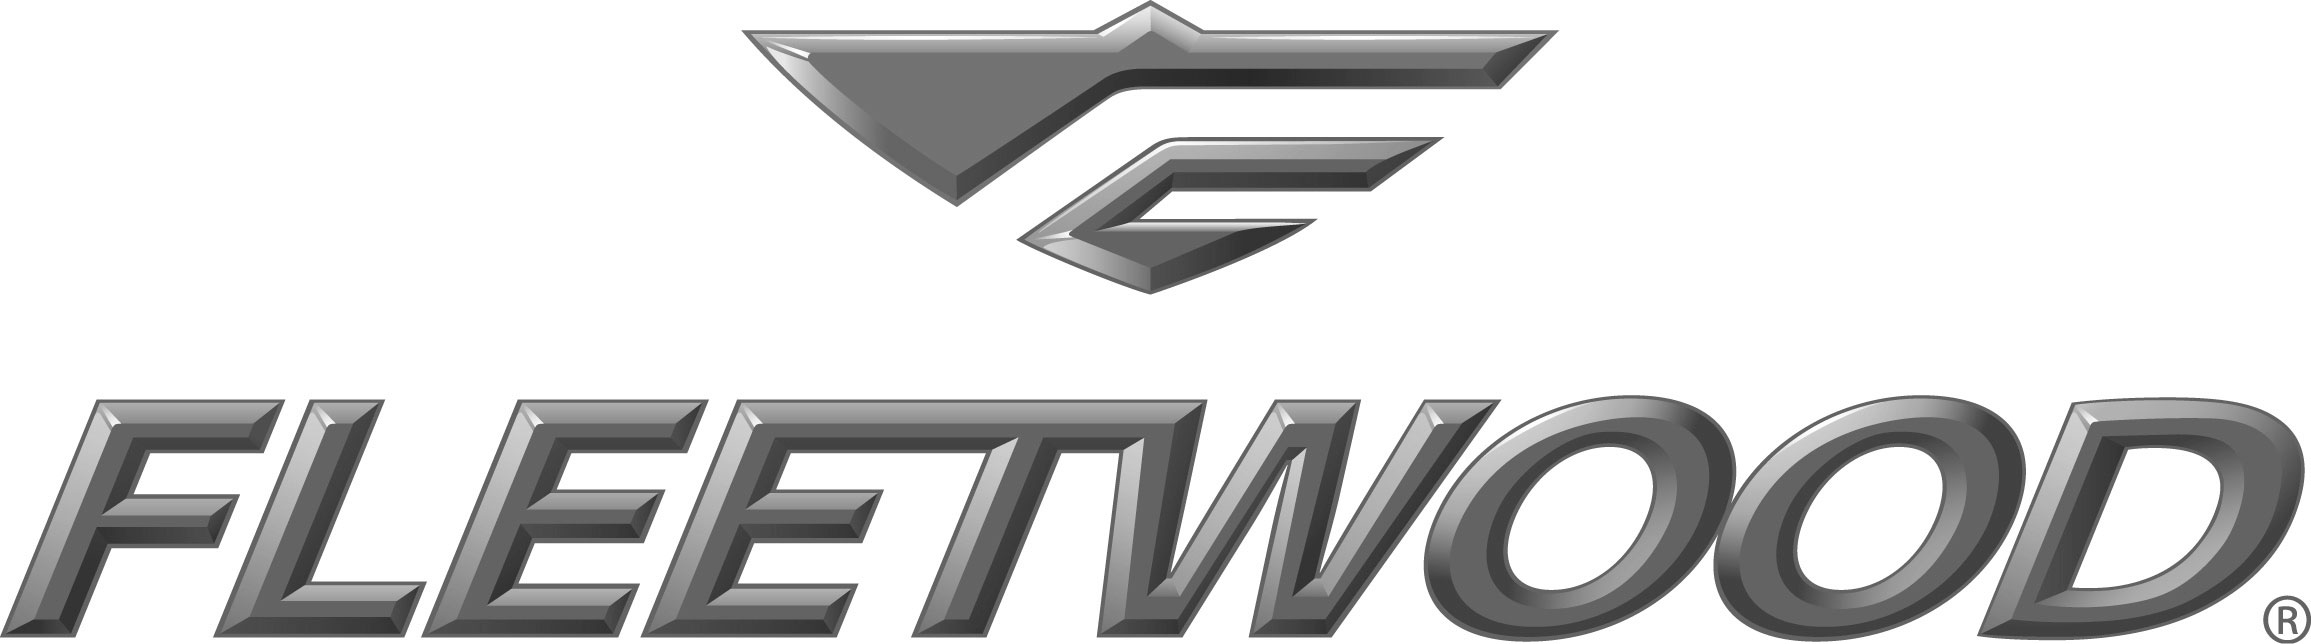 Fleetwood-Desaturated.jpg